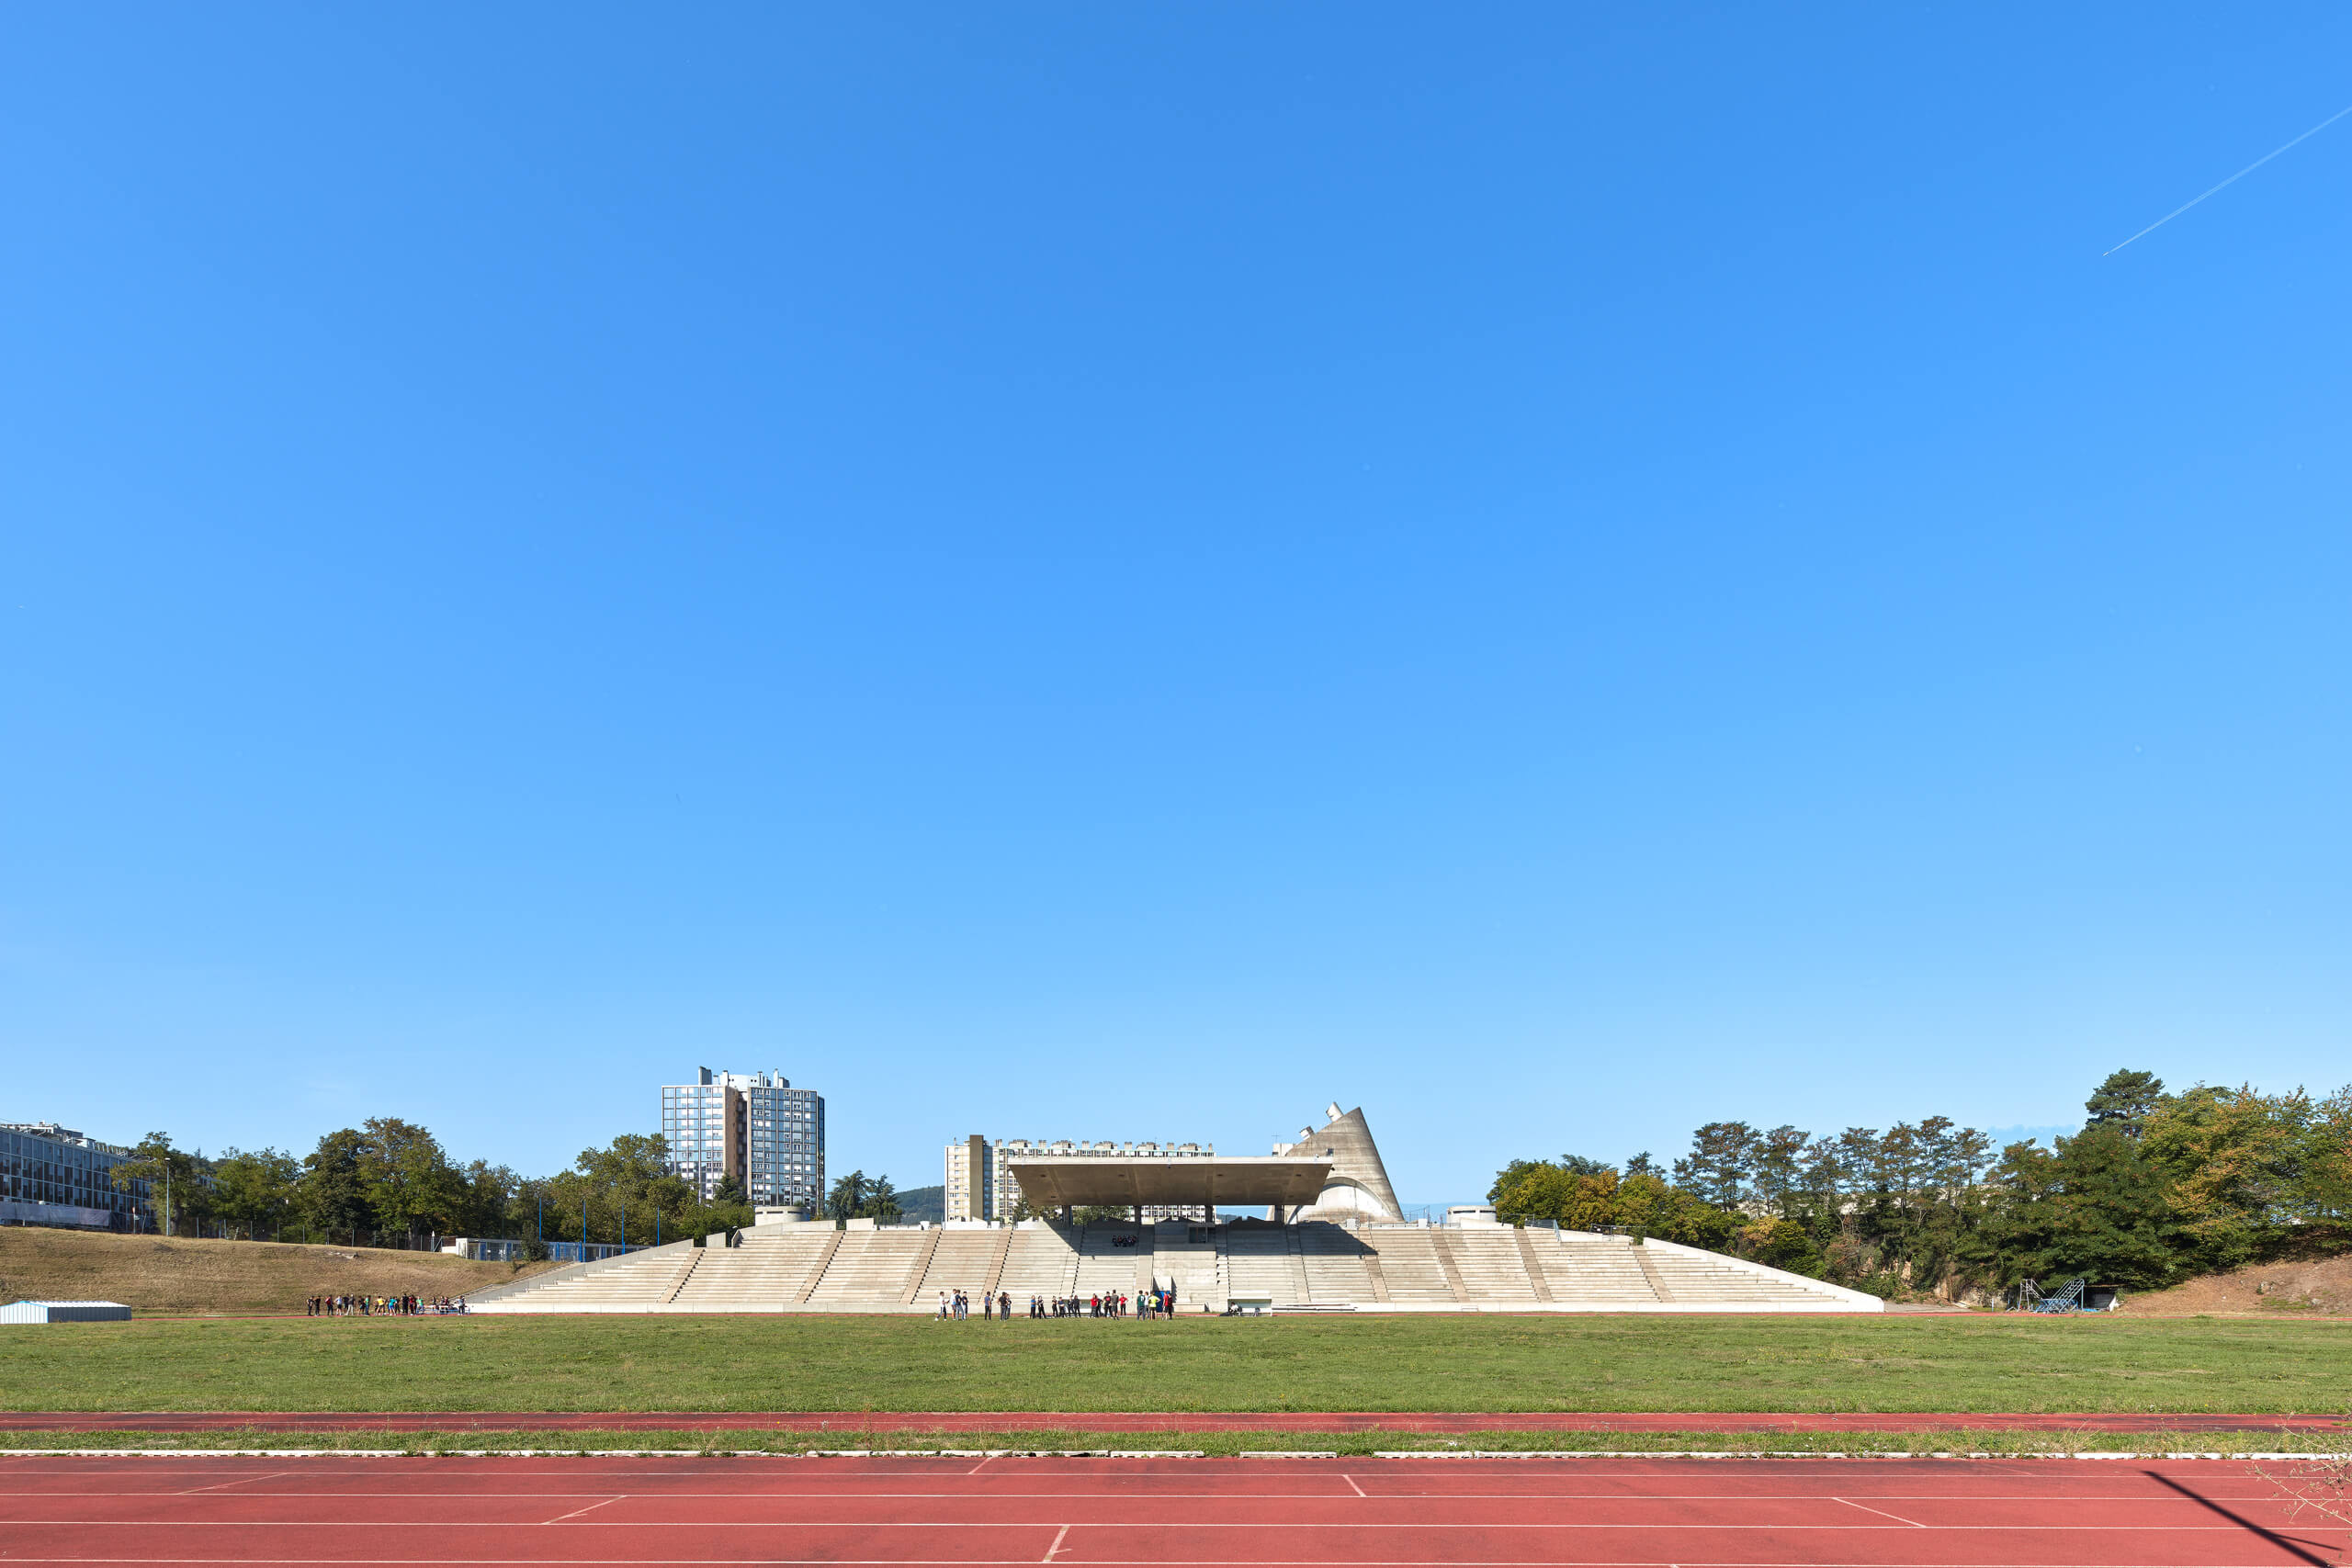 Federico_Covre_Le_Corbusier_Stadium_Firminy_2018_28